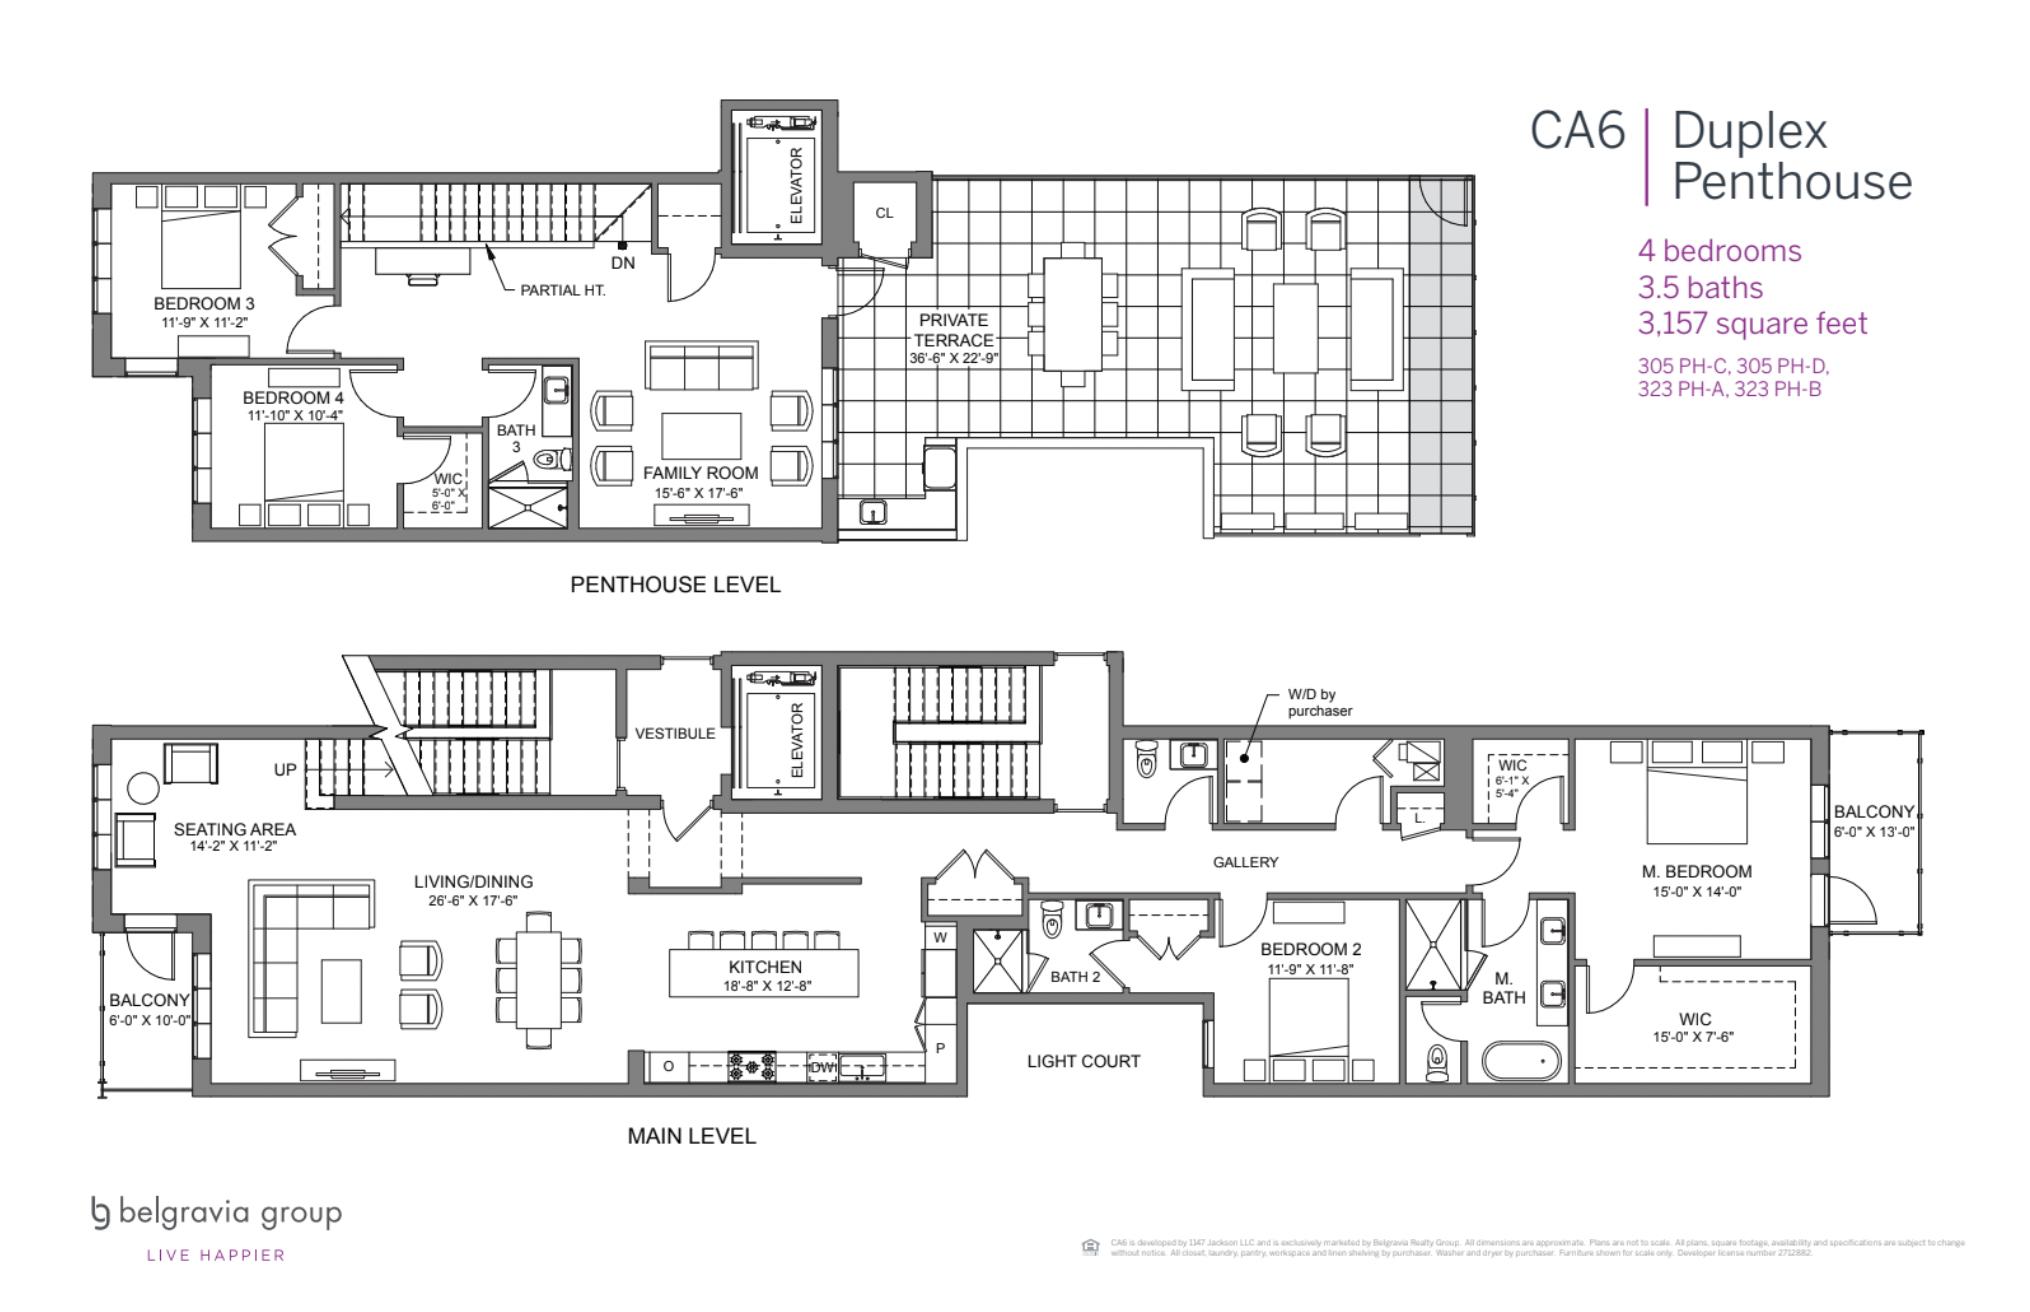 CA6 Condominiums Duplex Penthouse plan (1 of 2)